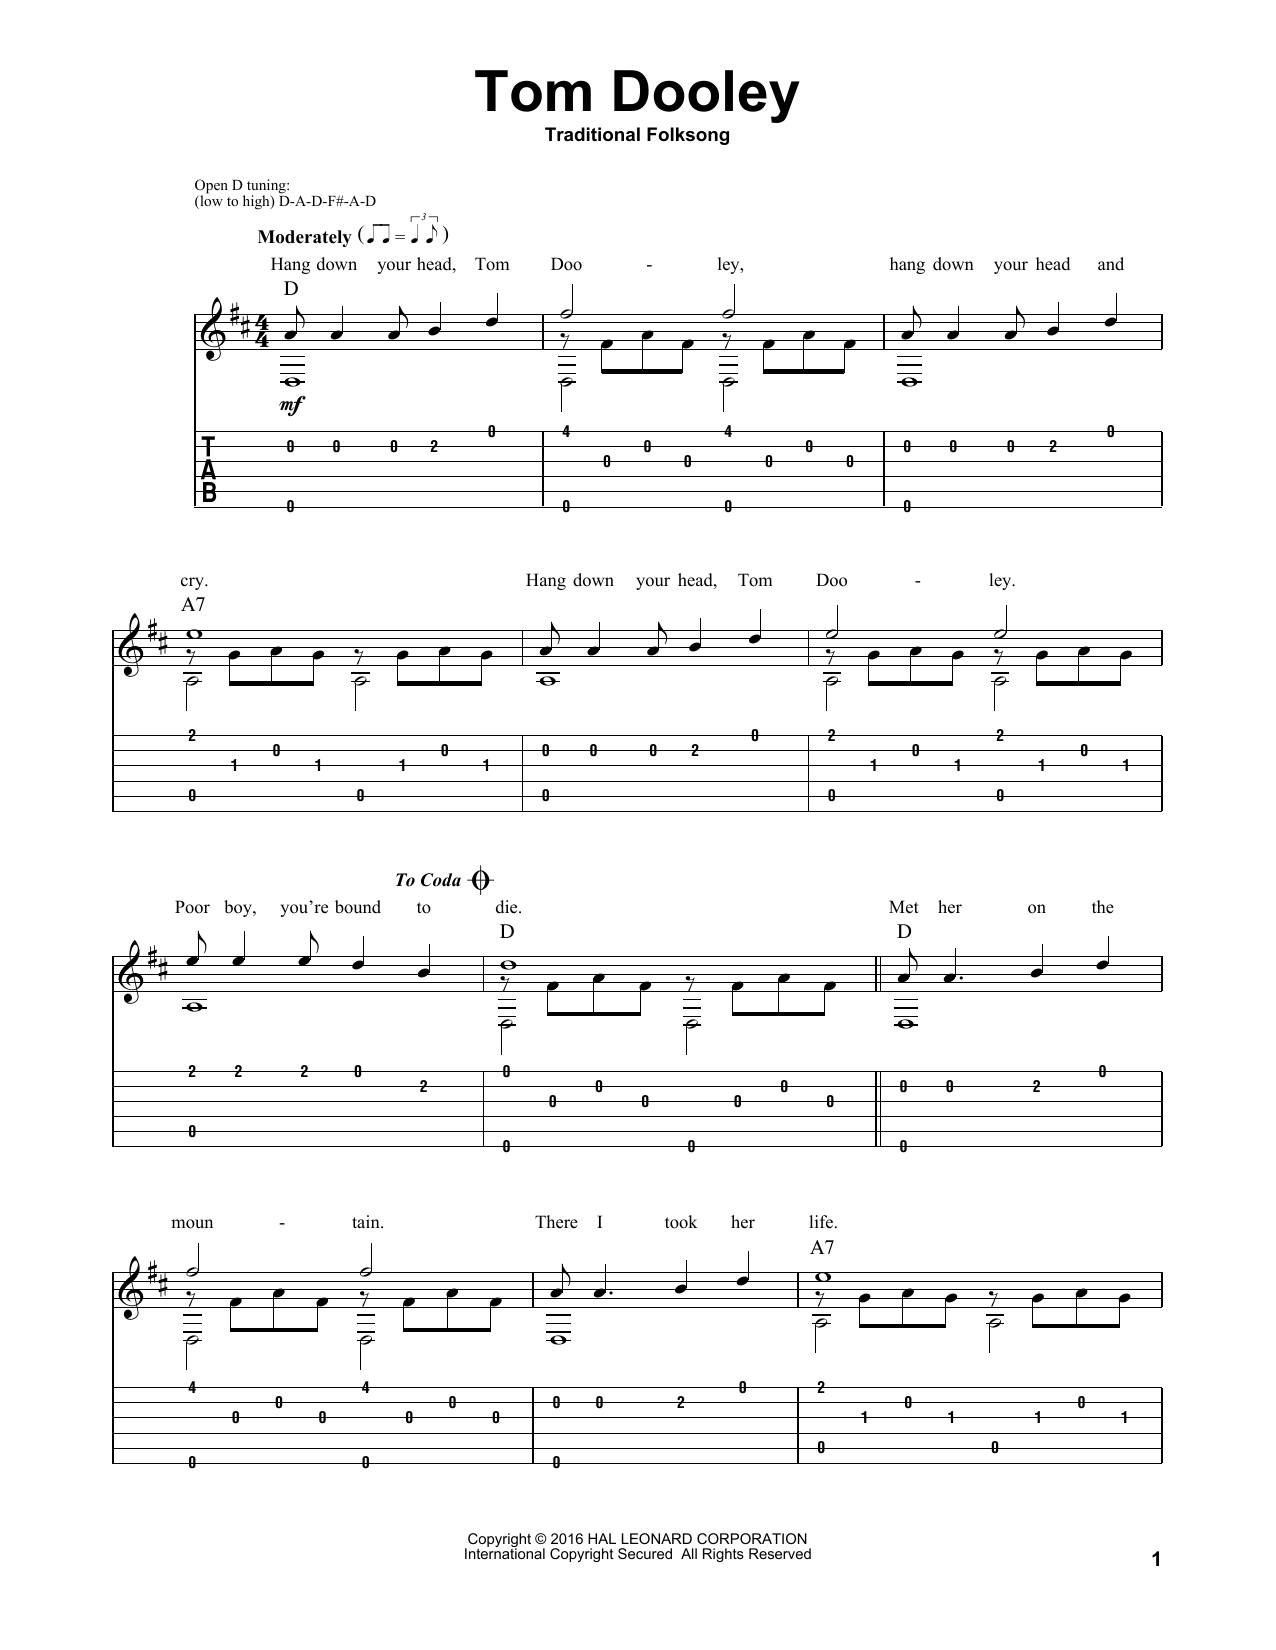 Tom Dooley Sheet Music